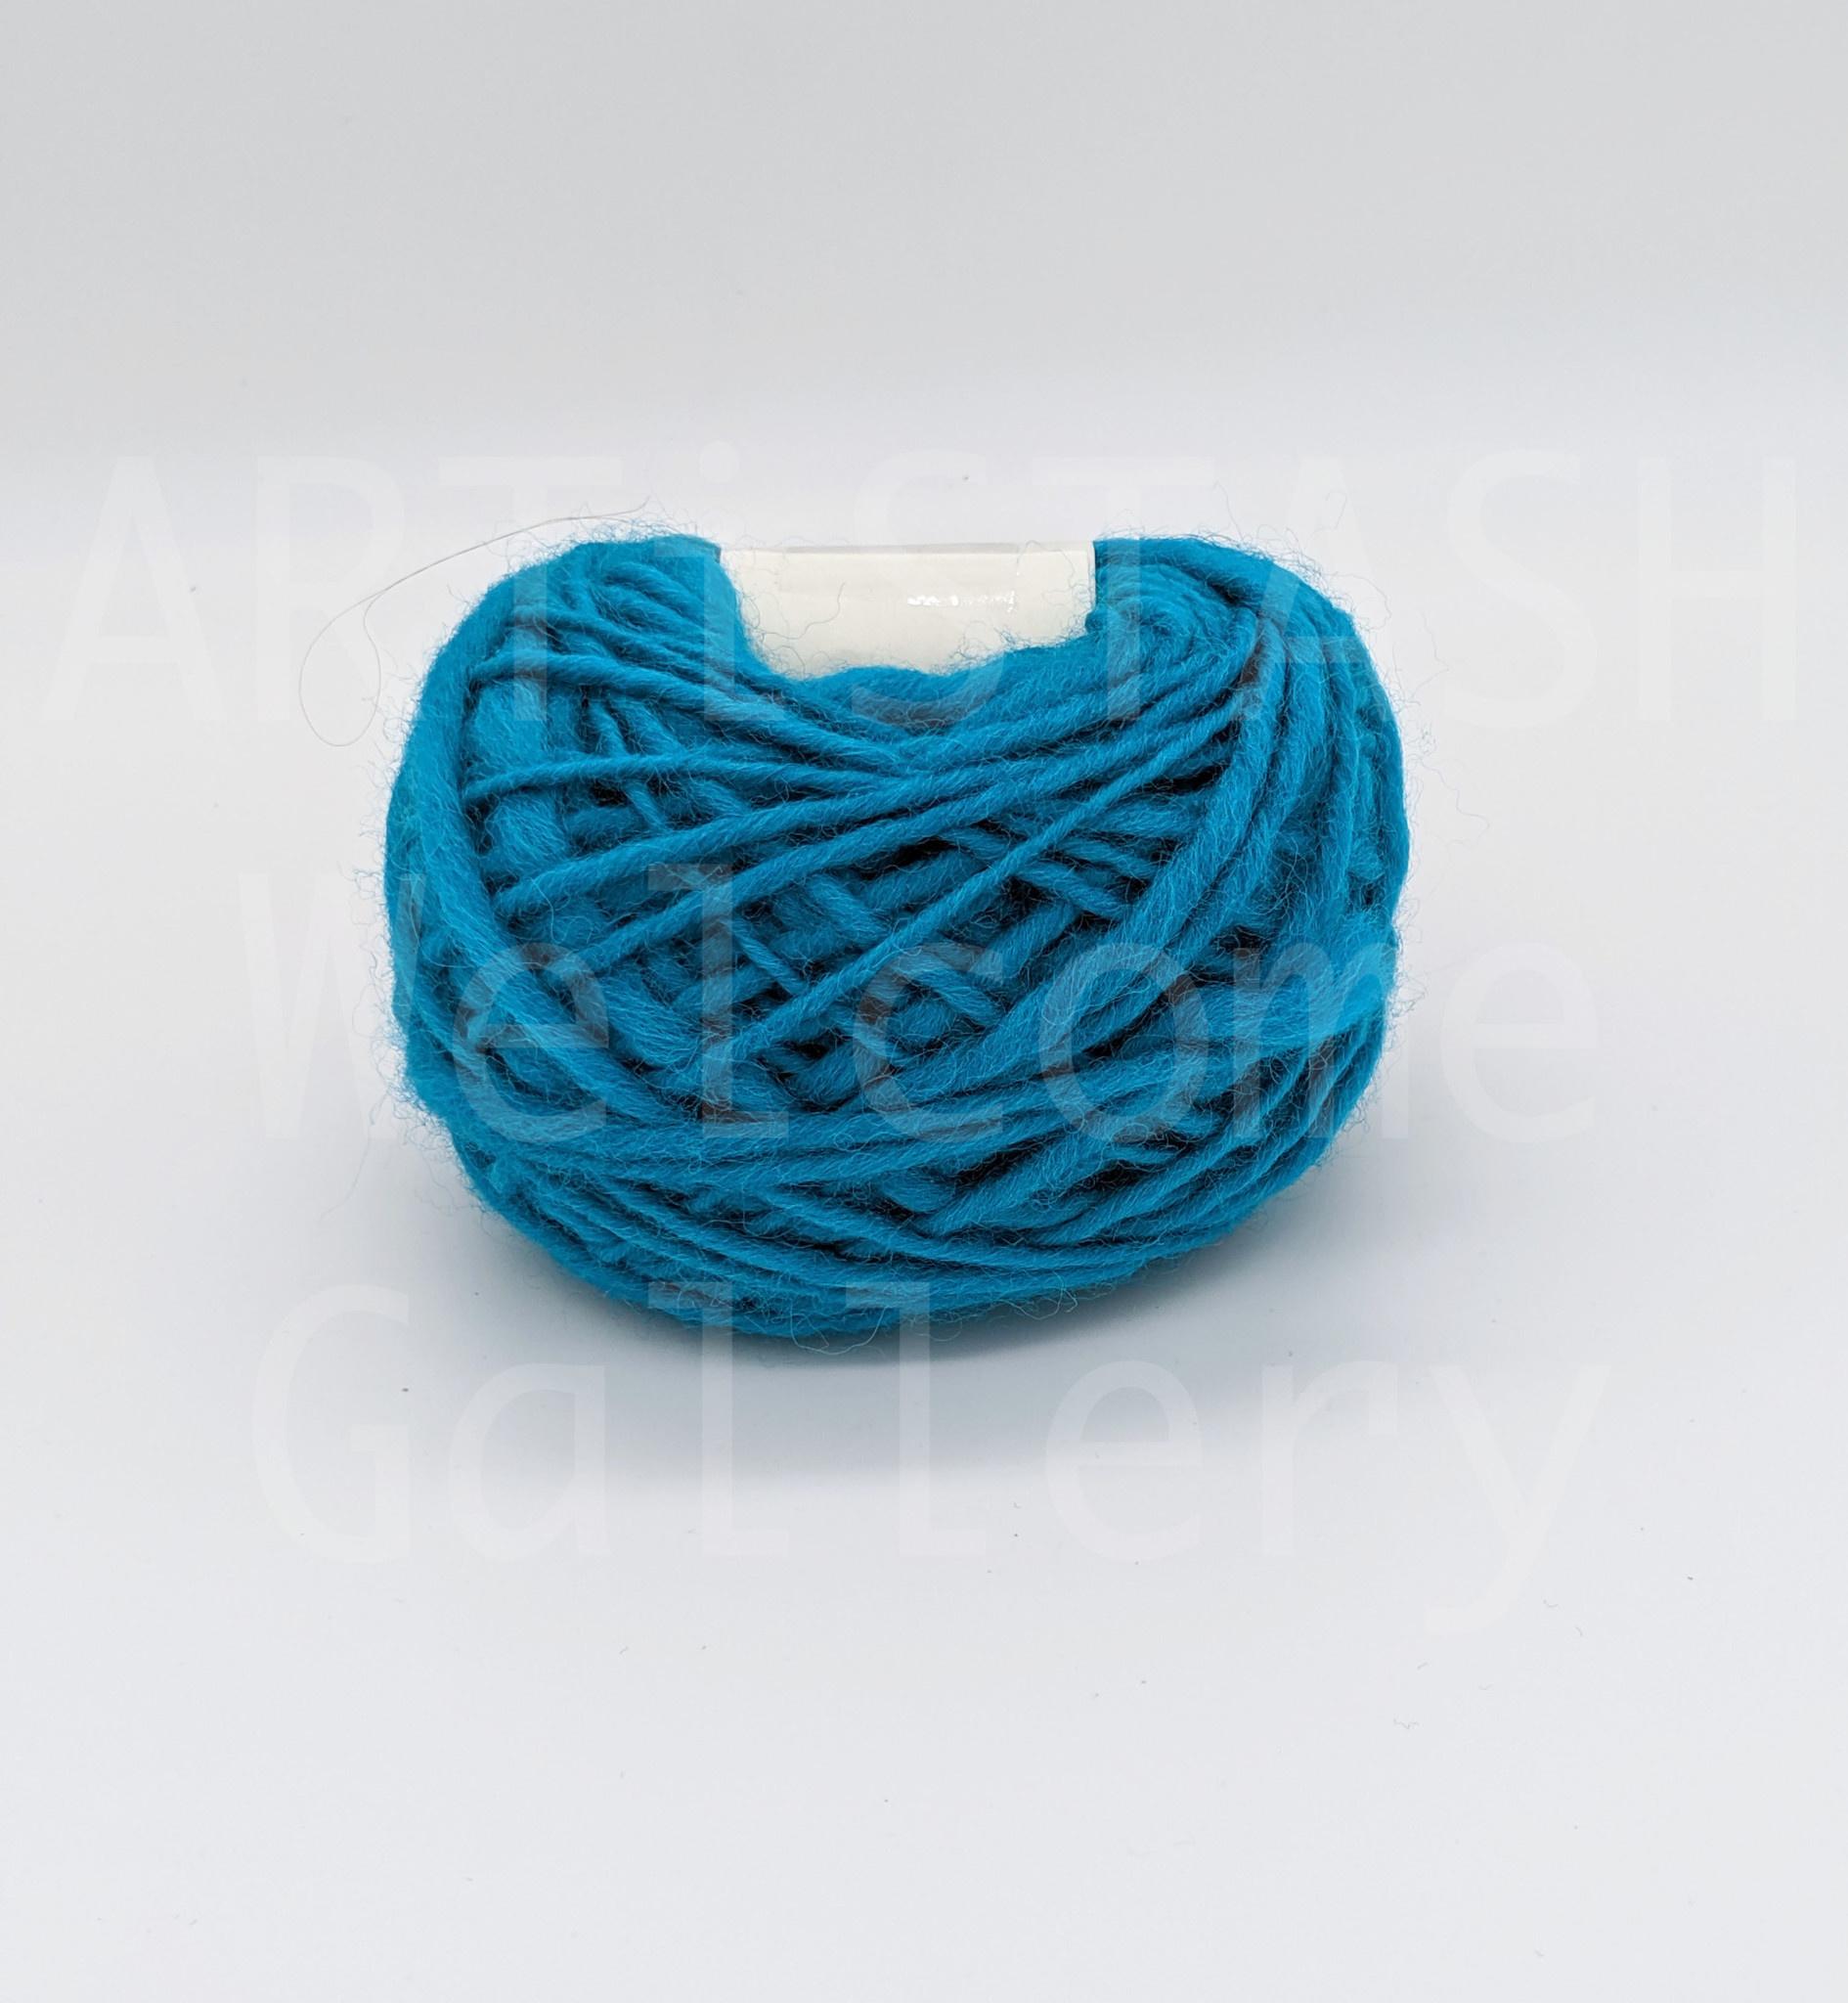 Just Sabine Hand Spun Yarn, Desert Turquoise, 51 Yards